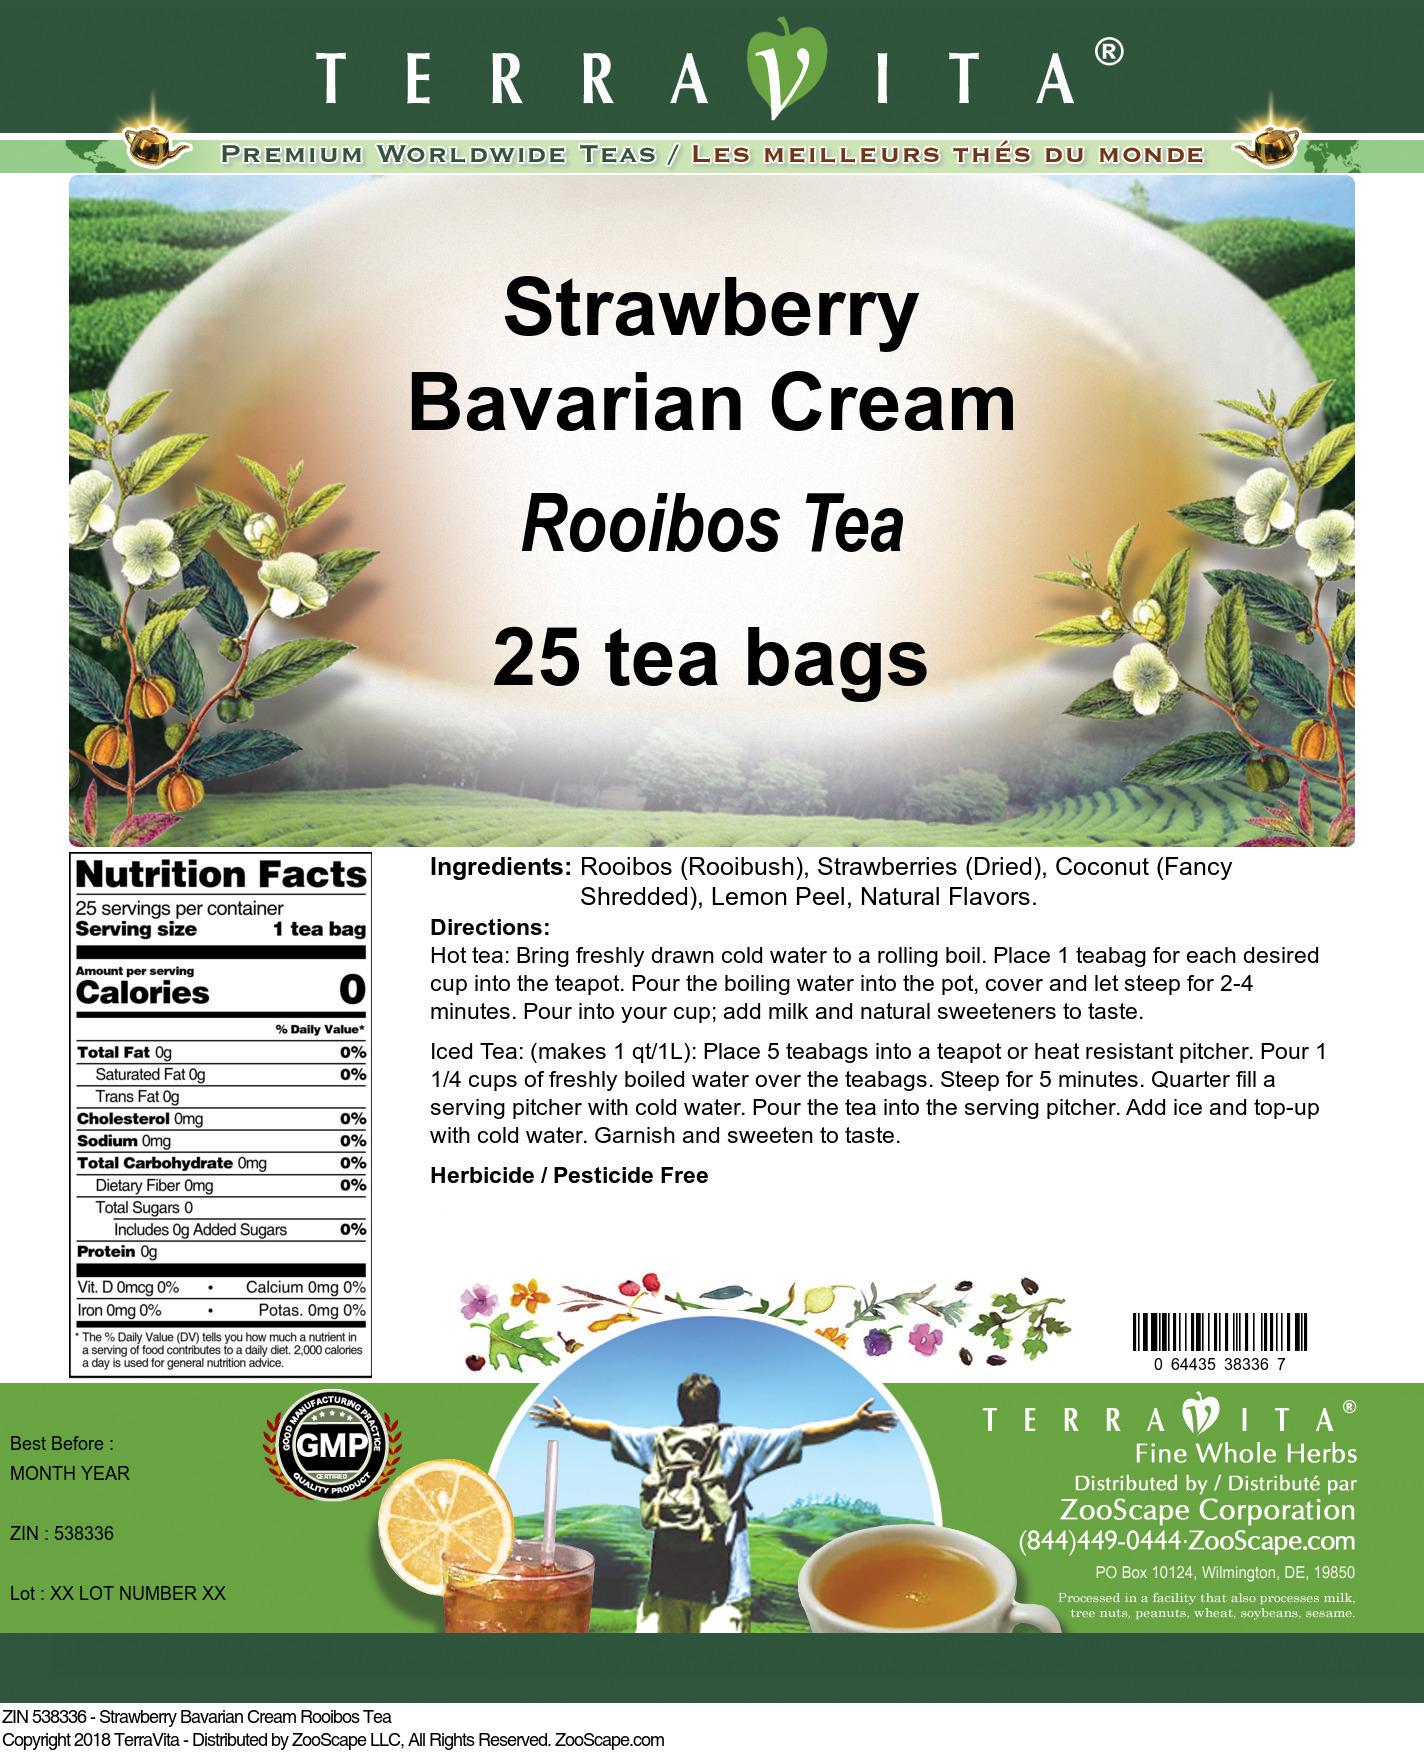 Strawberry Bavarian Cream Rooibos Tea